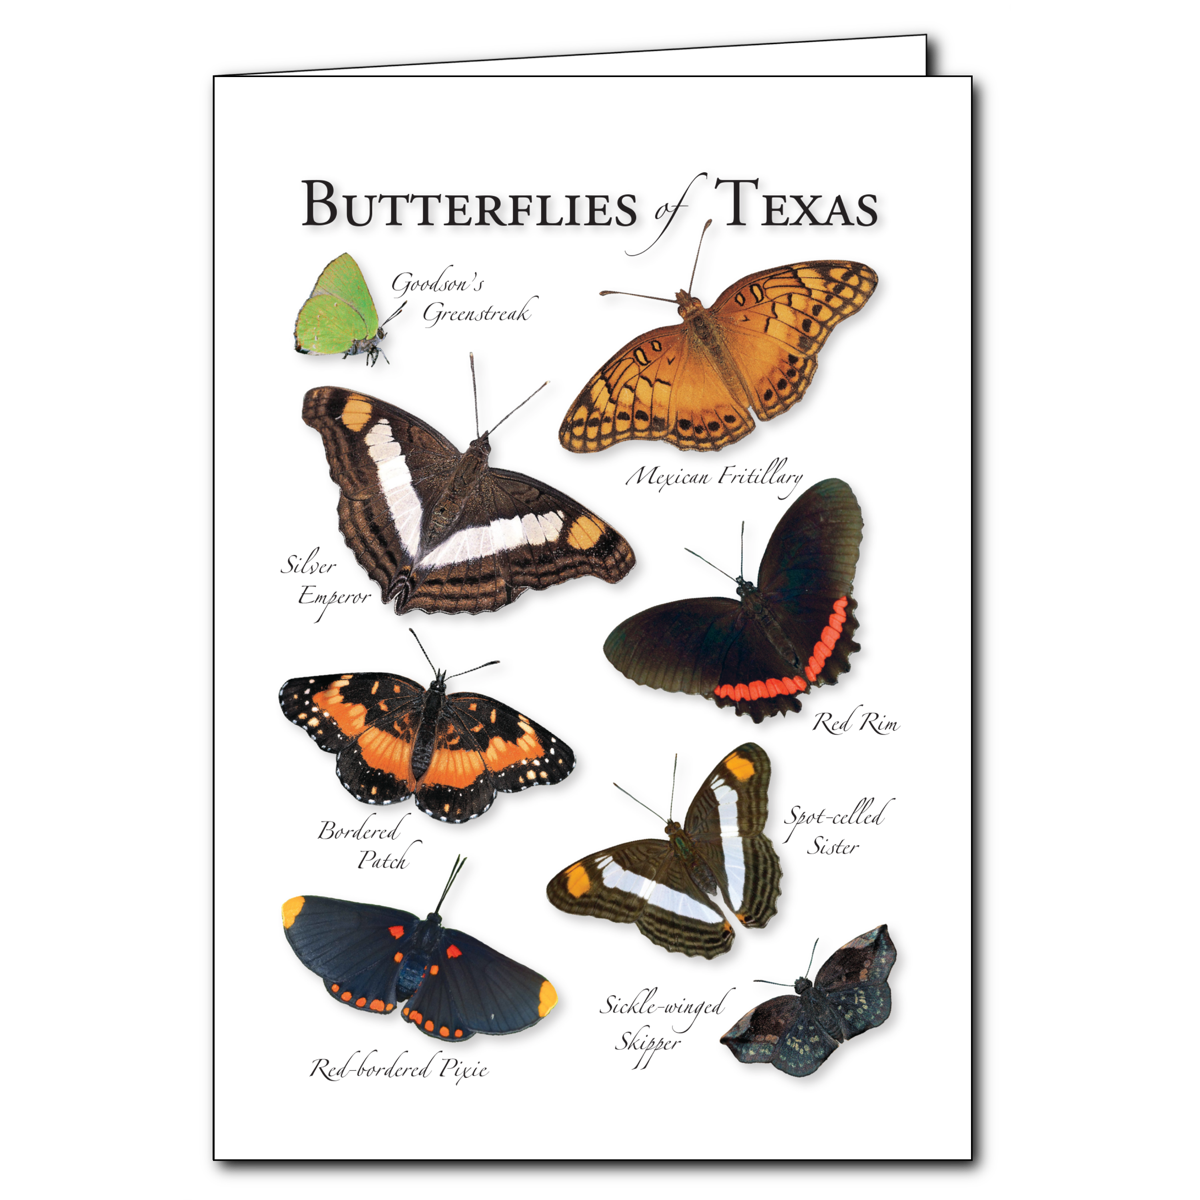 Butterflies of texas regional cardset of 6 greeting cards new butterflies of texas regional card set of 6 greeting cards new m4hsunfo